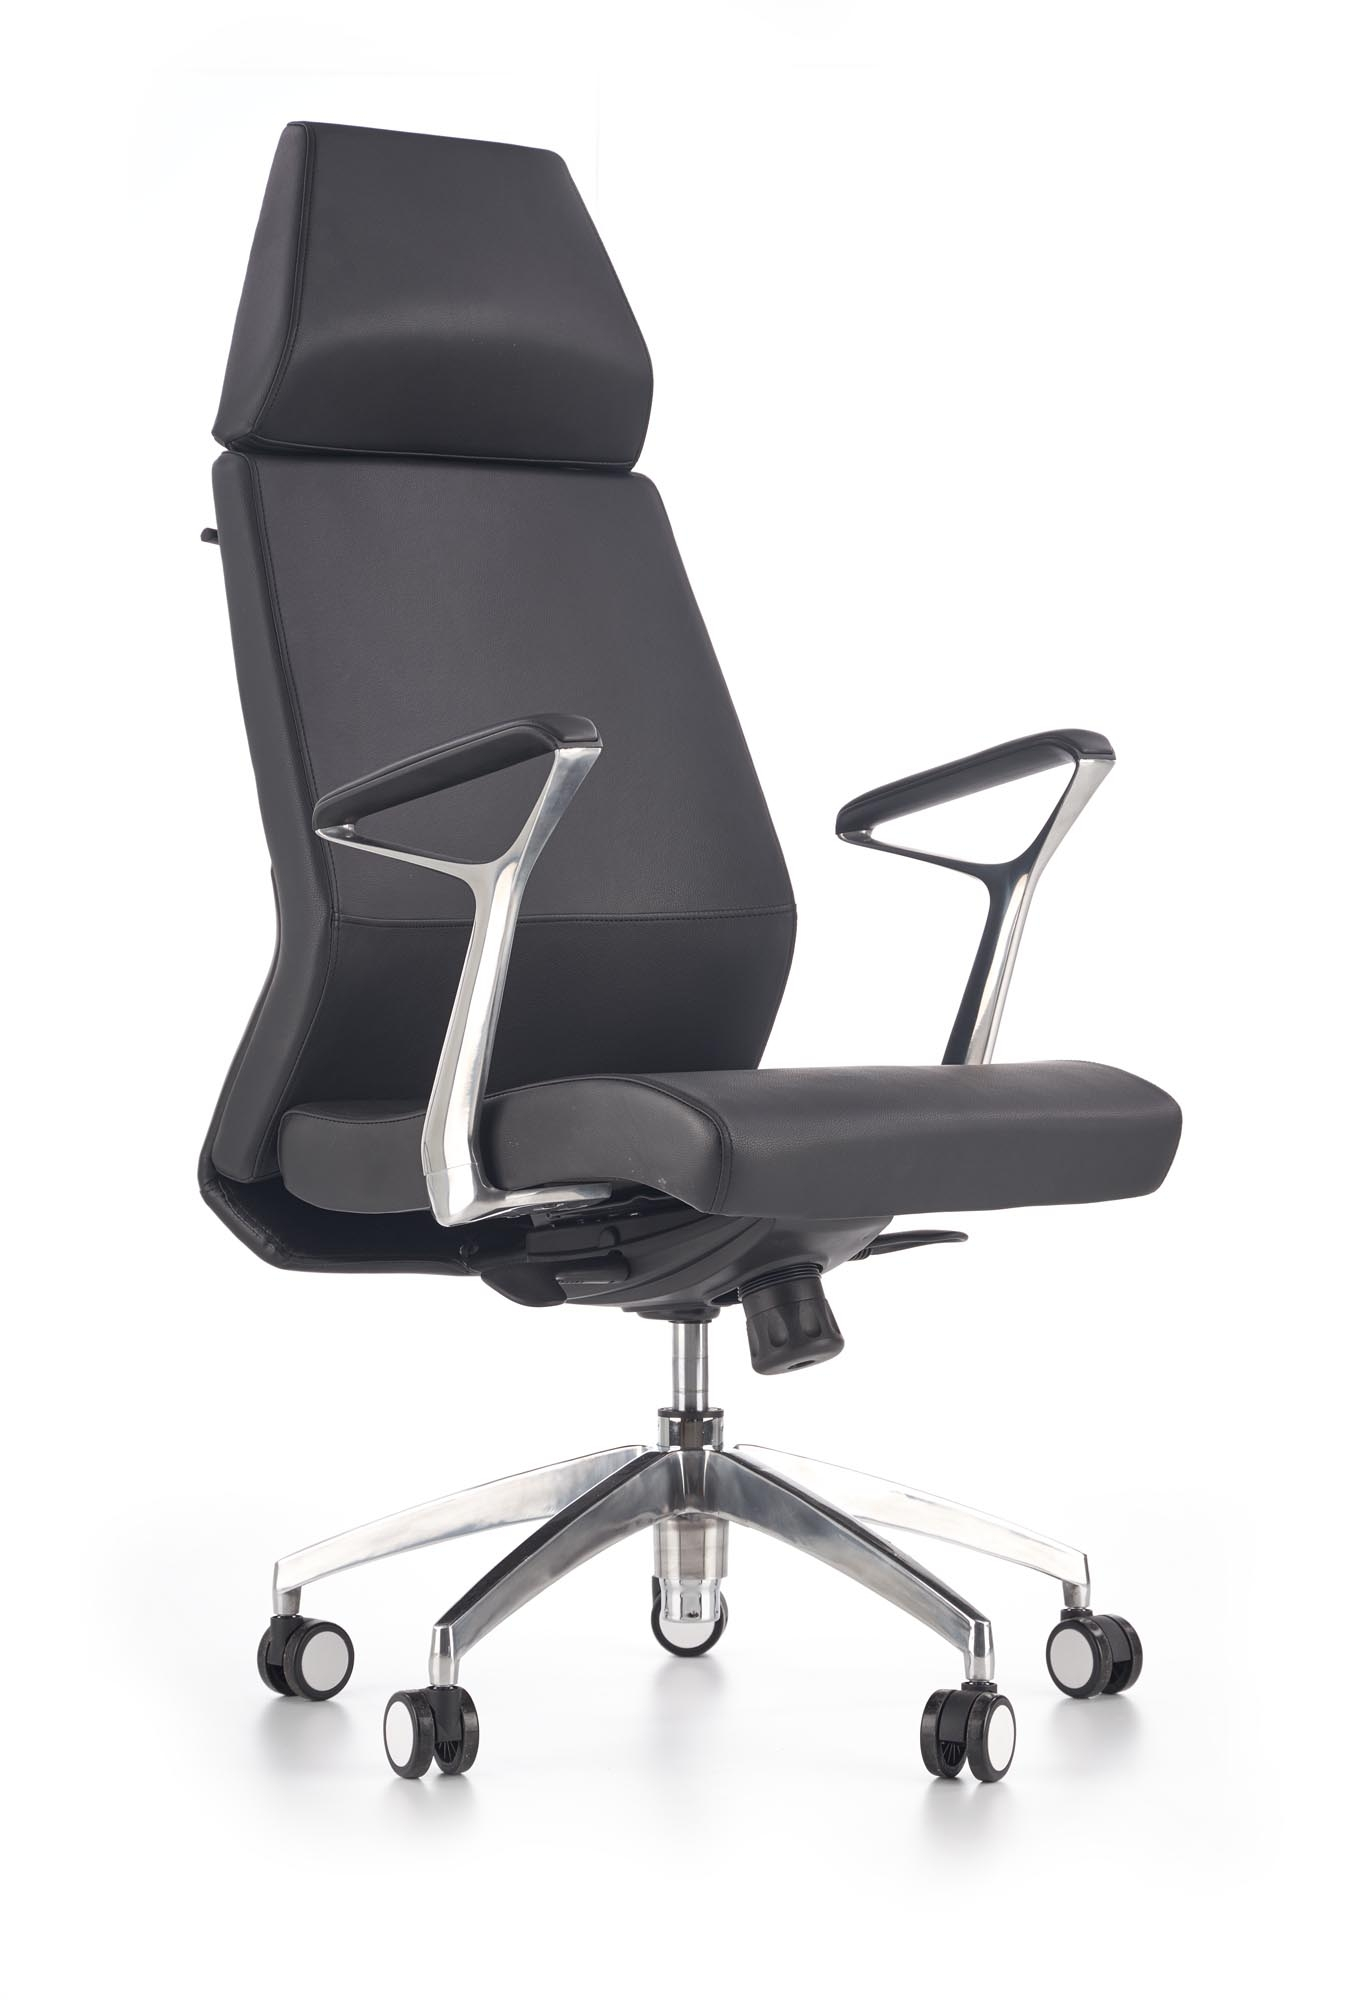 Scaun de birou ergonomic tapitat cu piele ecologica Inspiro Negru, l64xA67xH119-125 cm